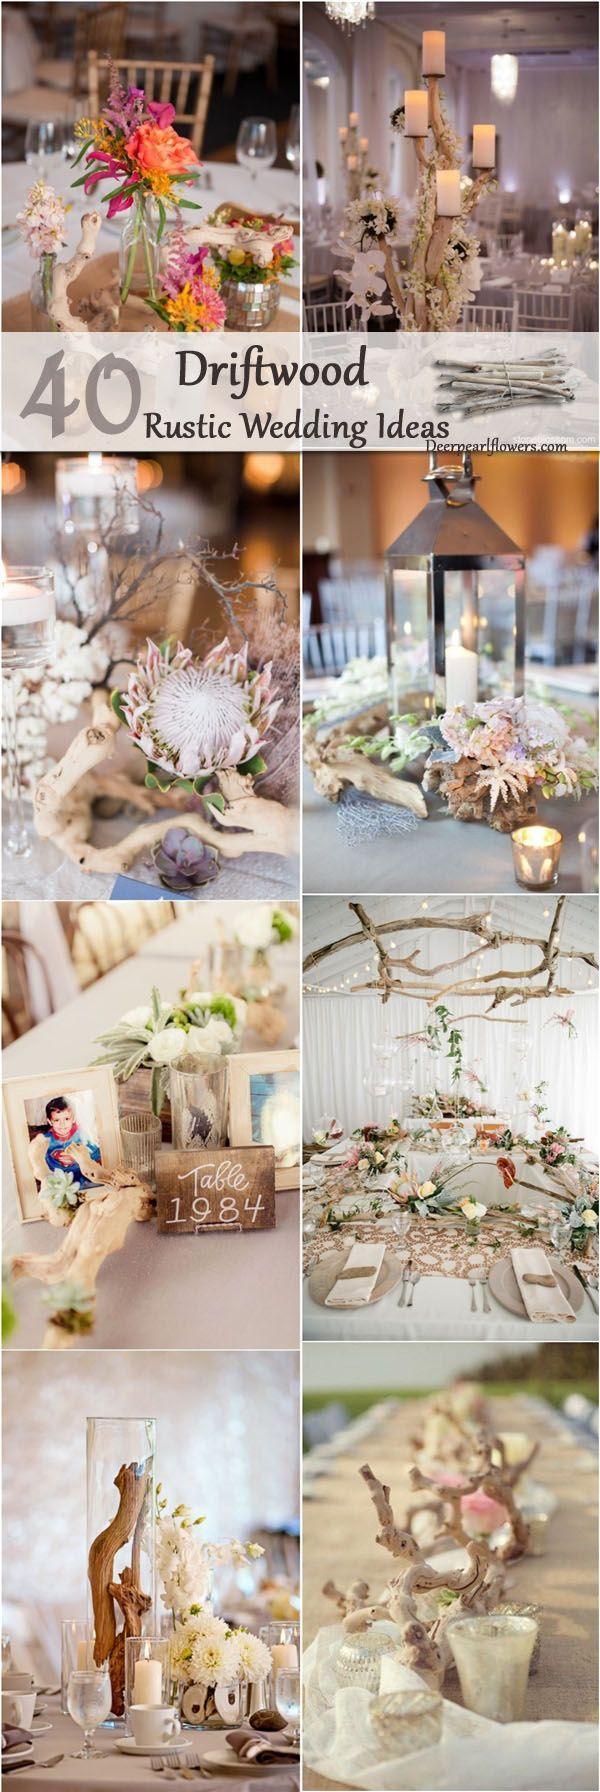 rustic country beach driftwood wedding ideas / http://www.deerpearlflowers.com/driftwood-wedding-decor-ideas/2/